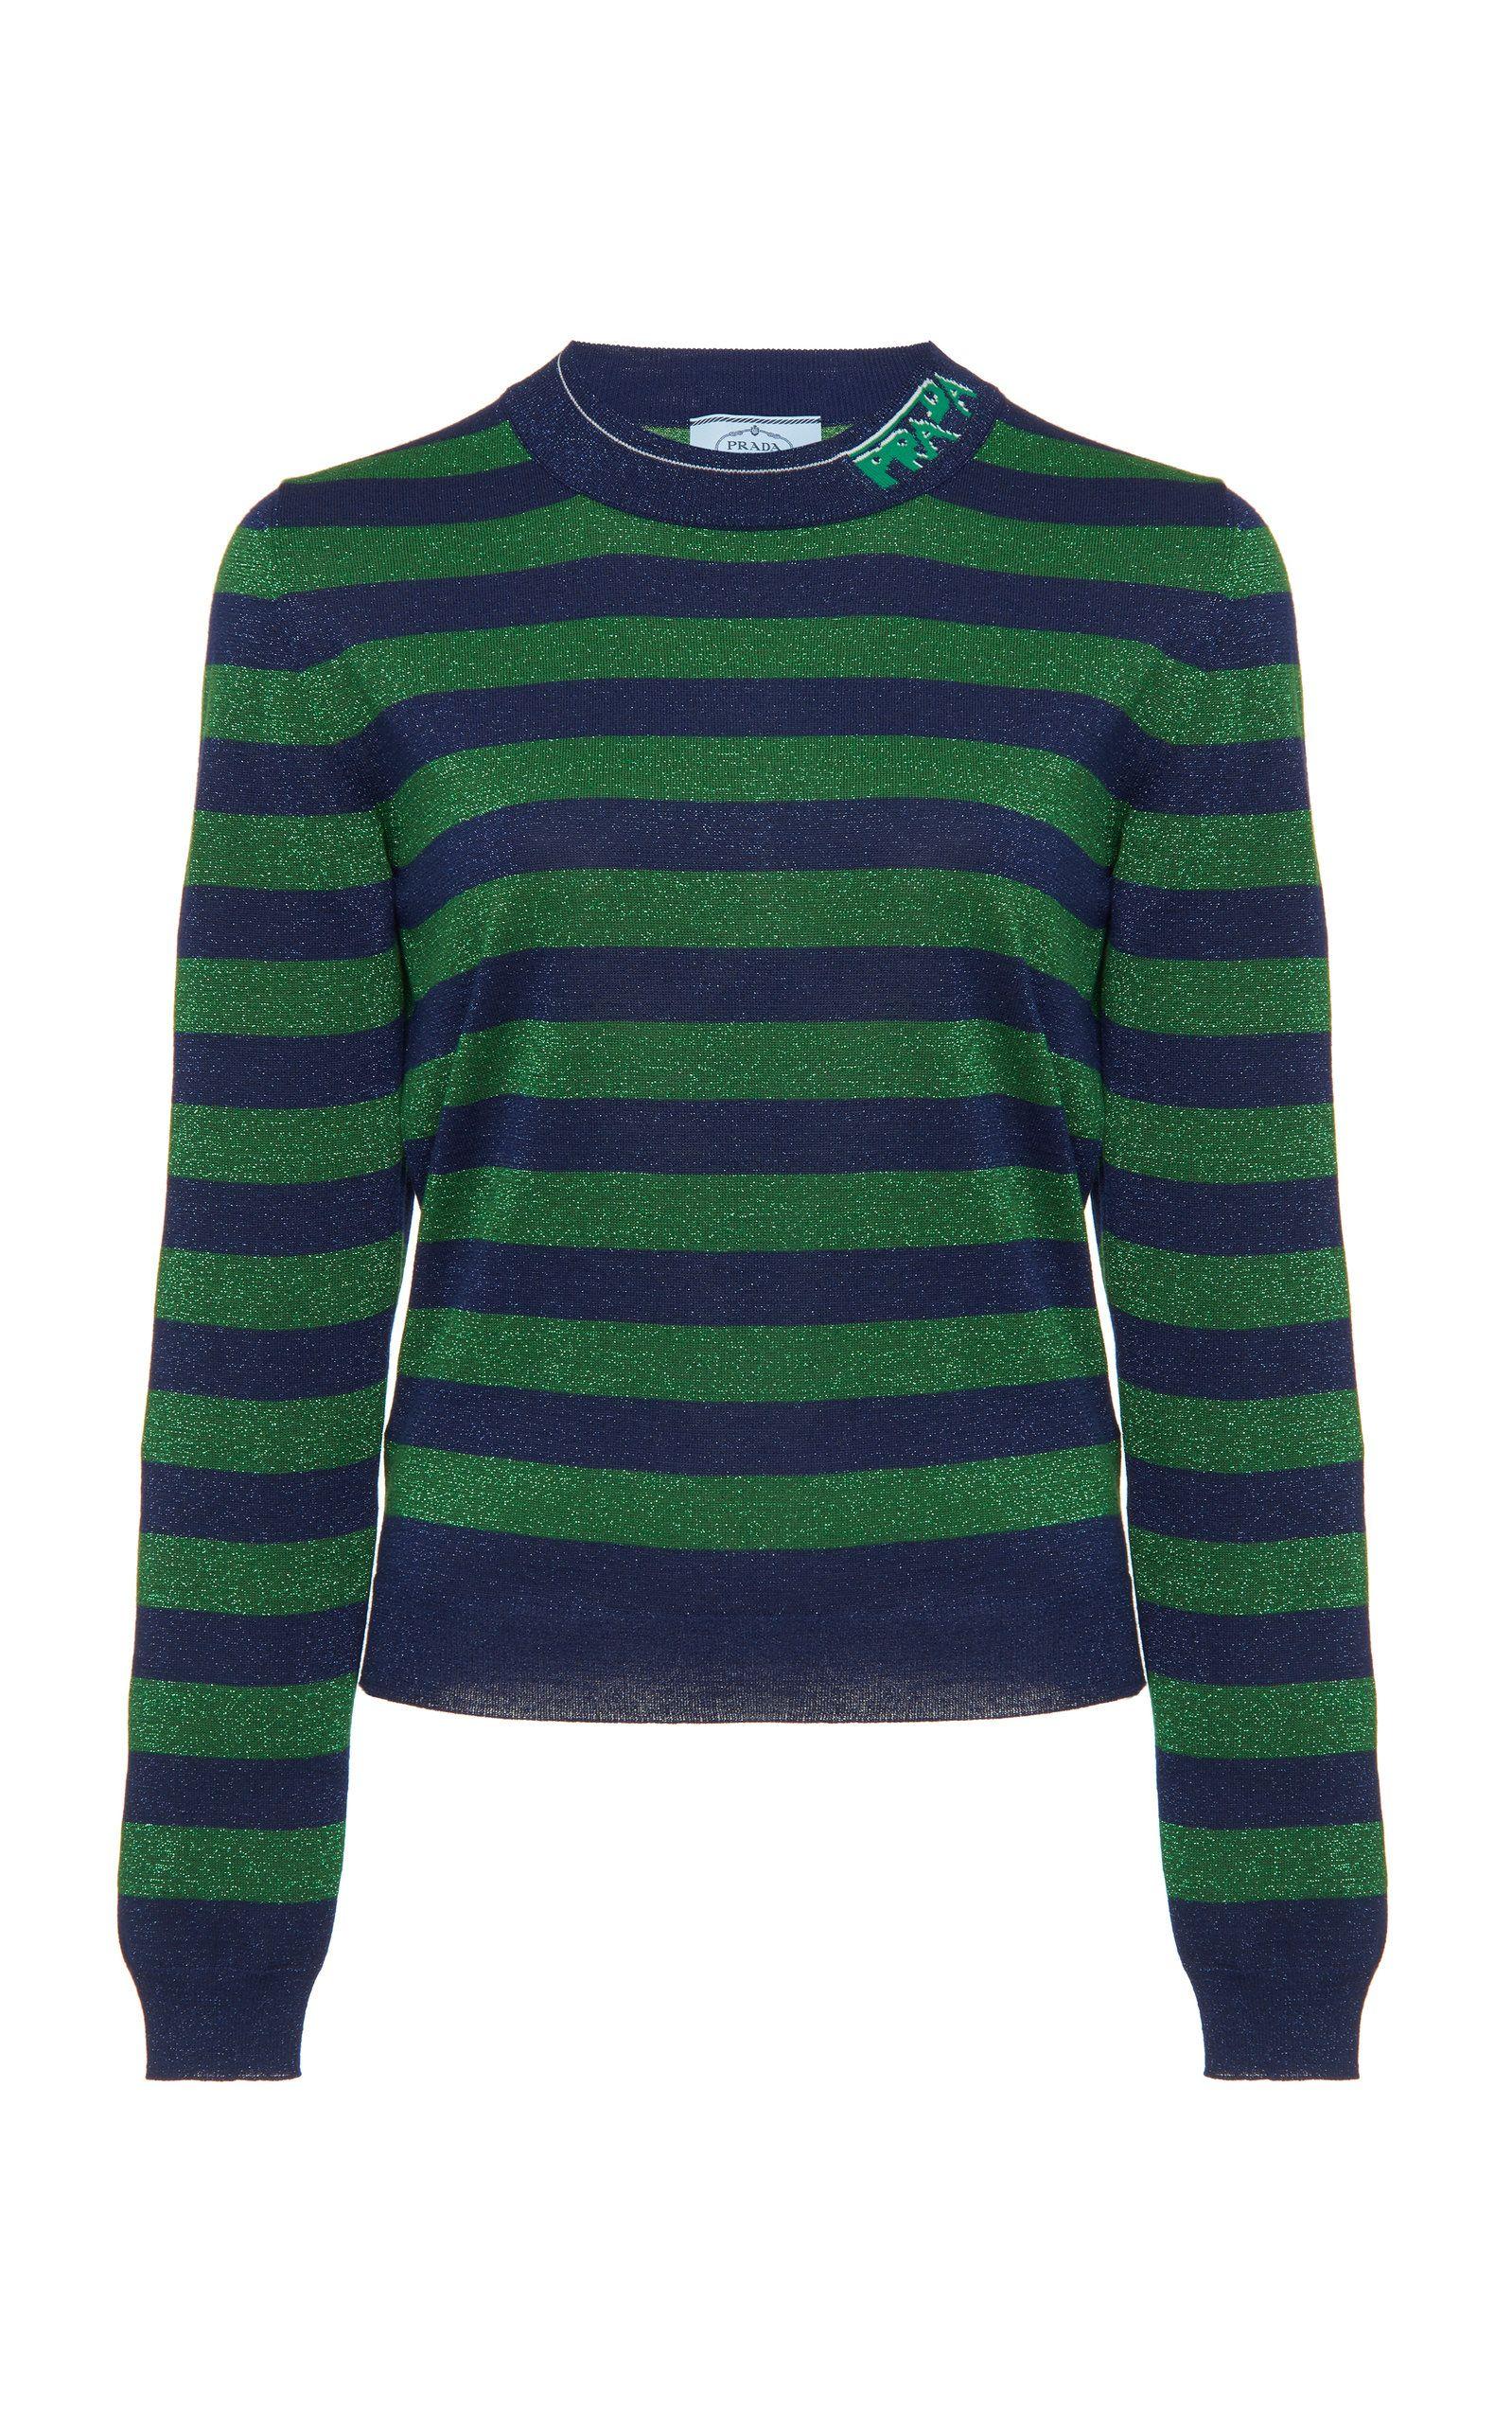 99864ad685ec PRADA STRIPED WOOL SWEATER. #prada #cloth | Prada | Wool sweaters ...